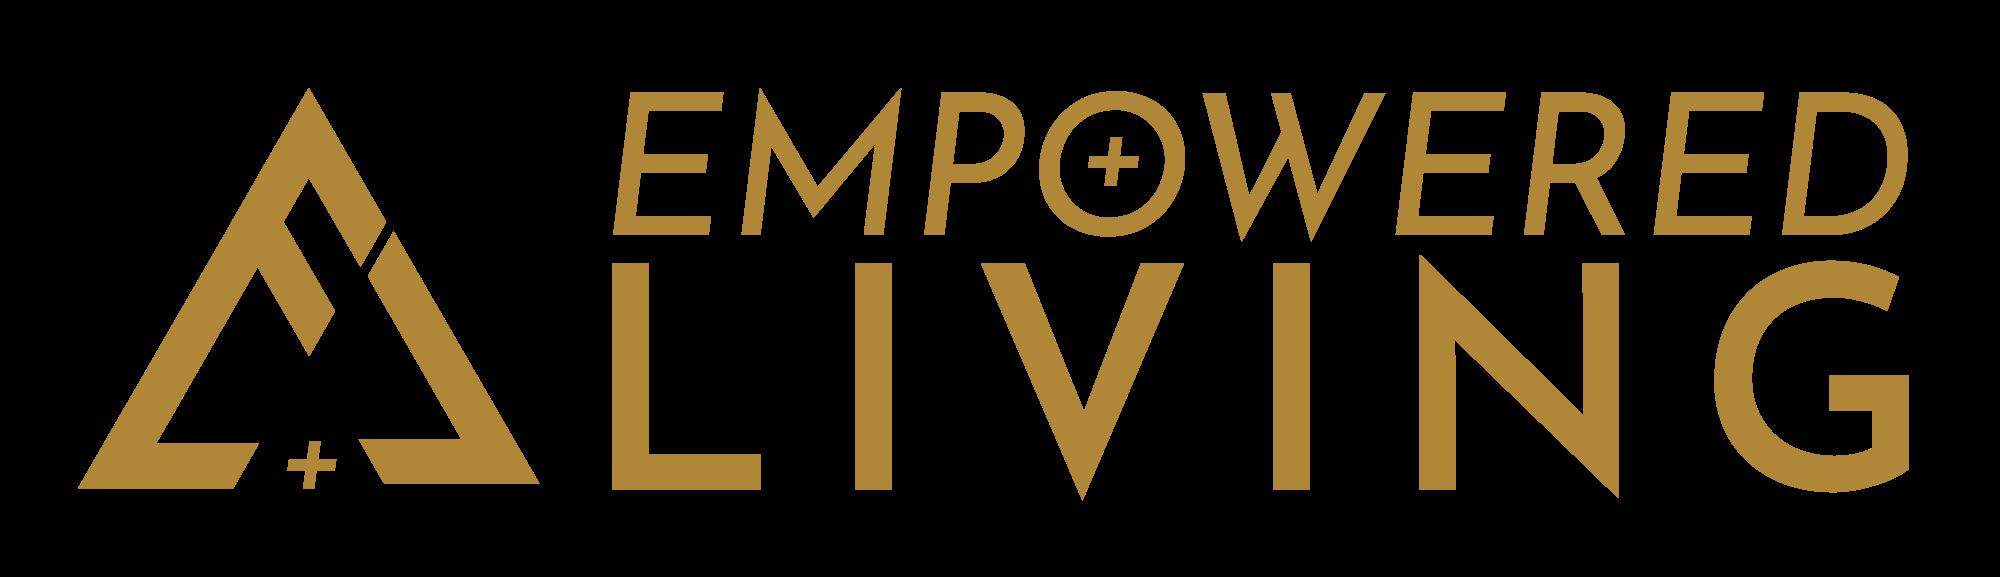 empowered living logo